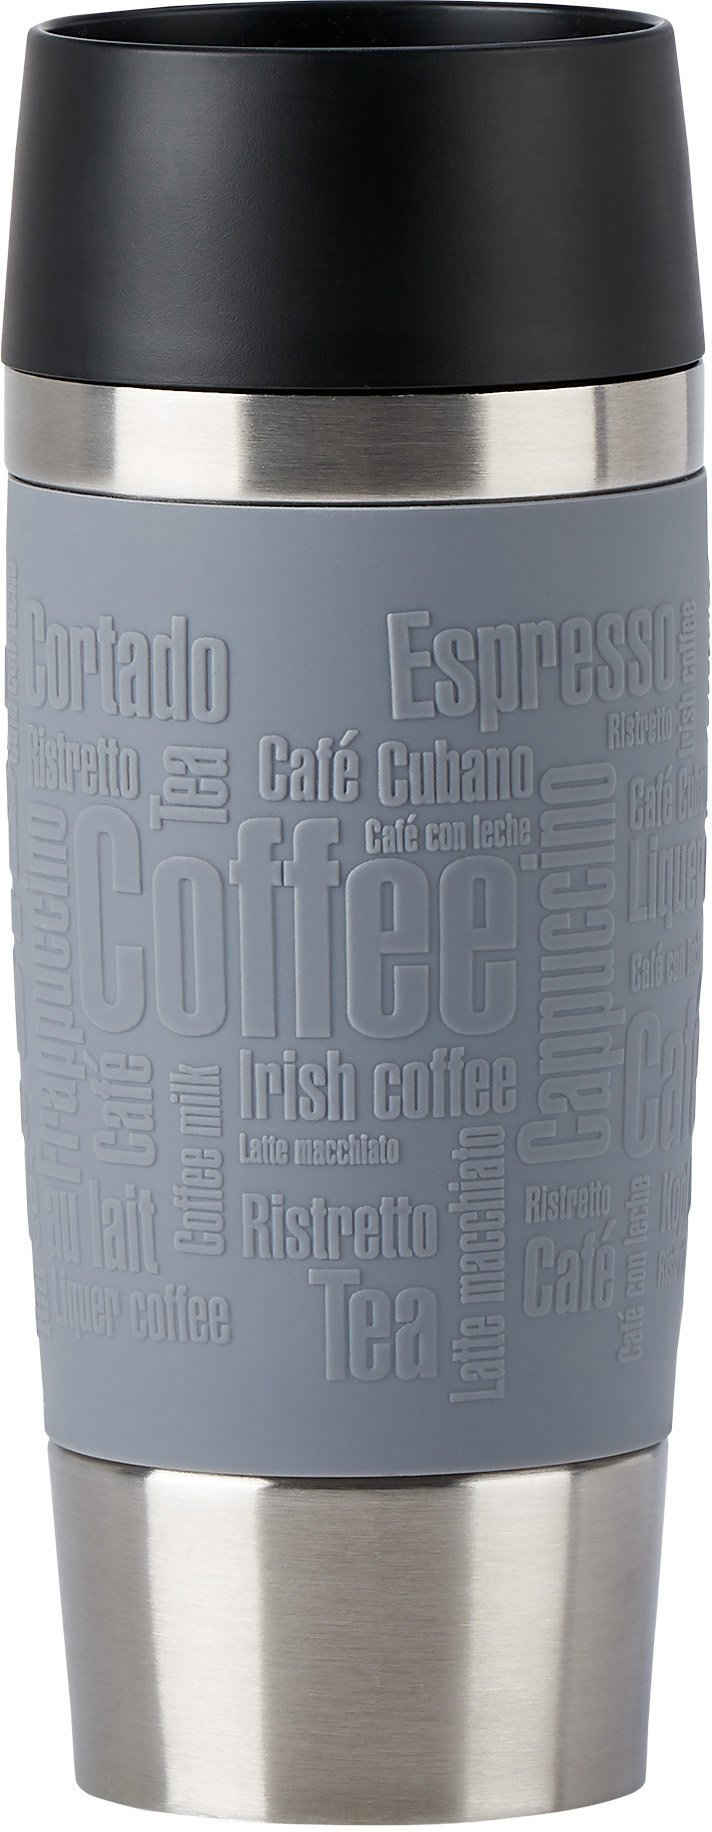 Emsa Thermobecher »Travel Mug«, Edelstahl, Silikon, Kunststoff, 100% dicht, 360 ml